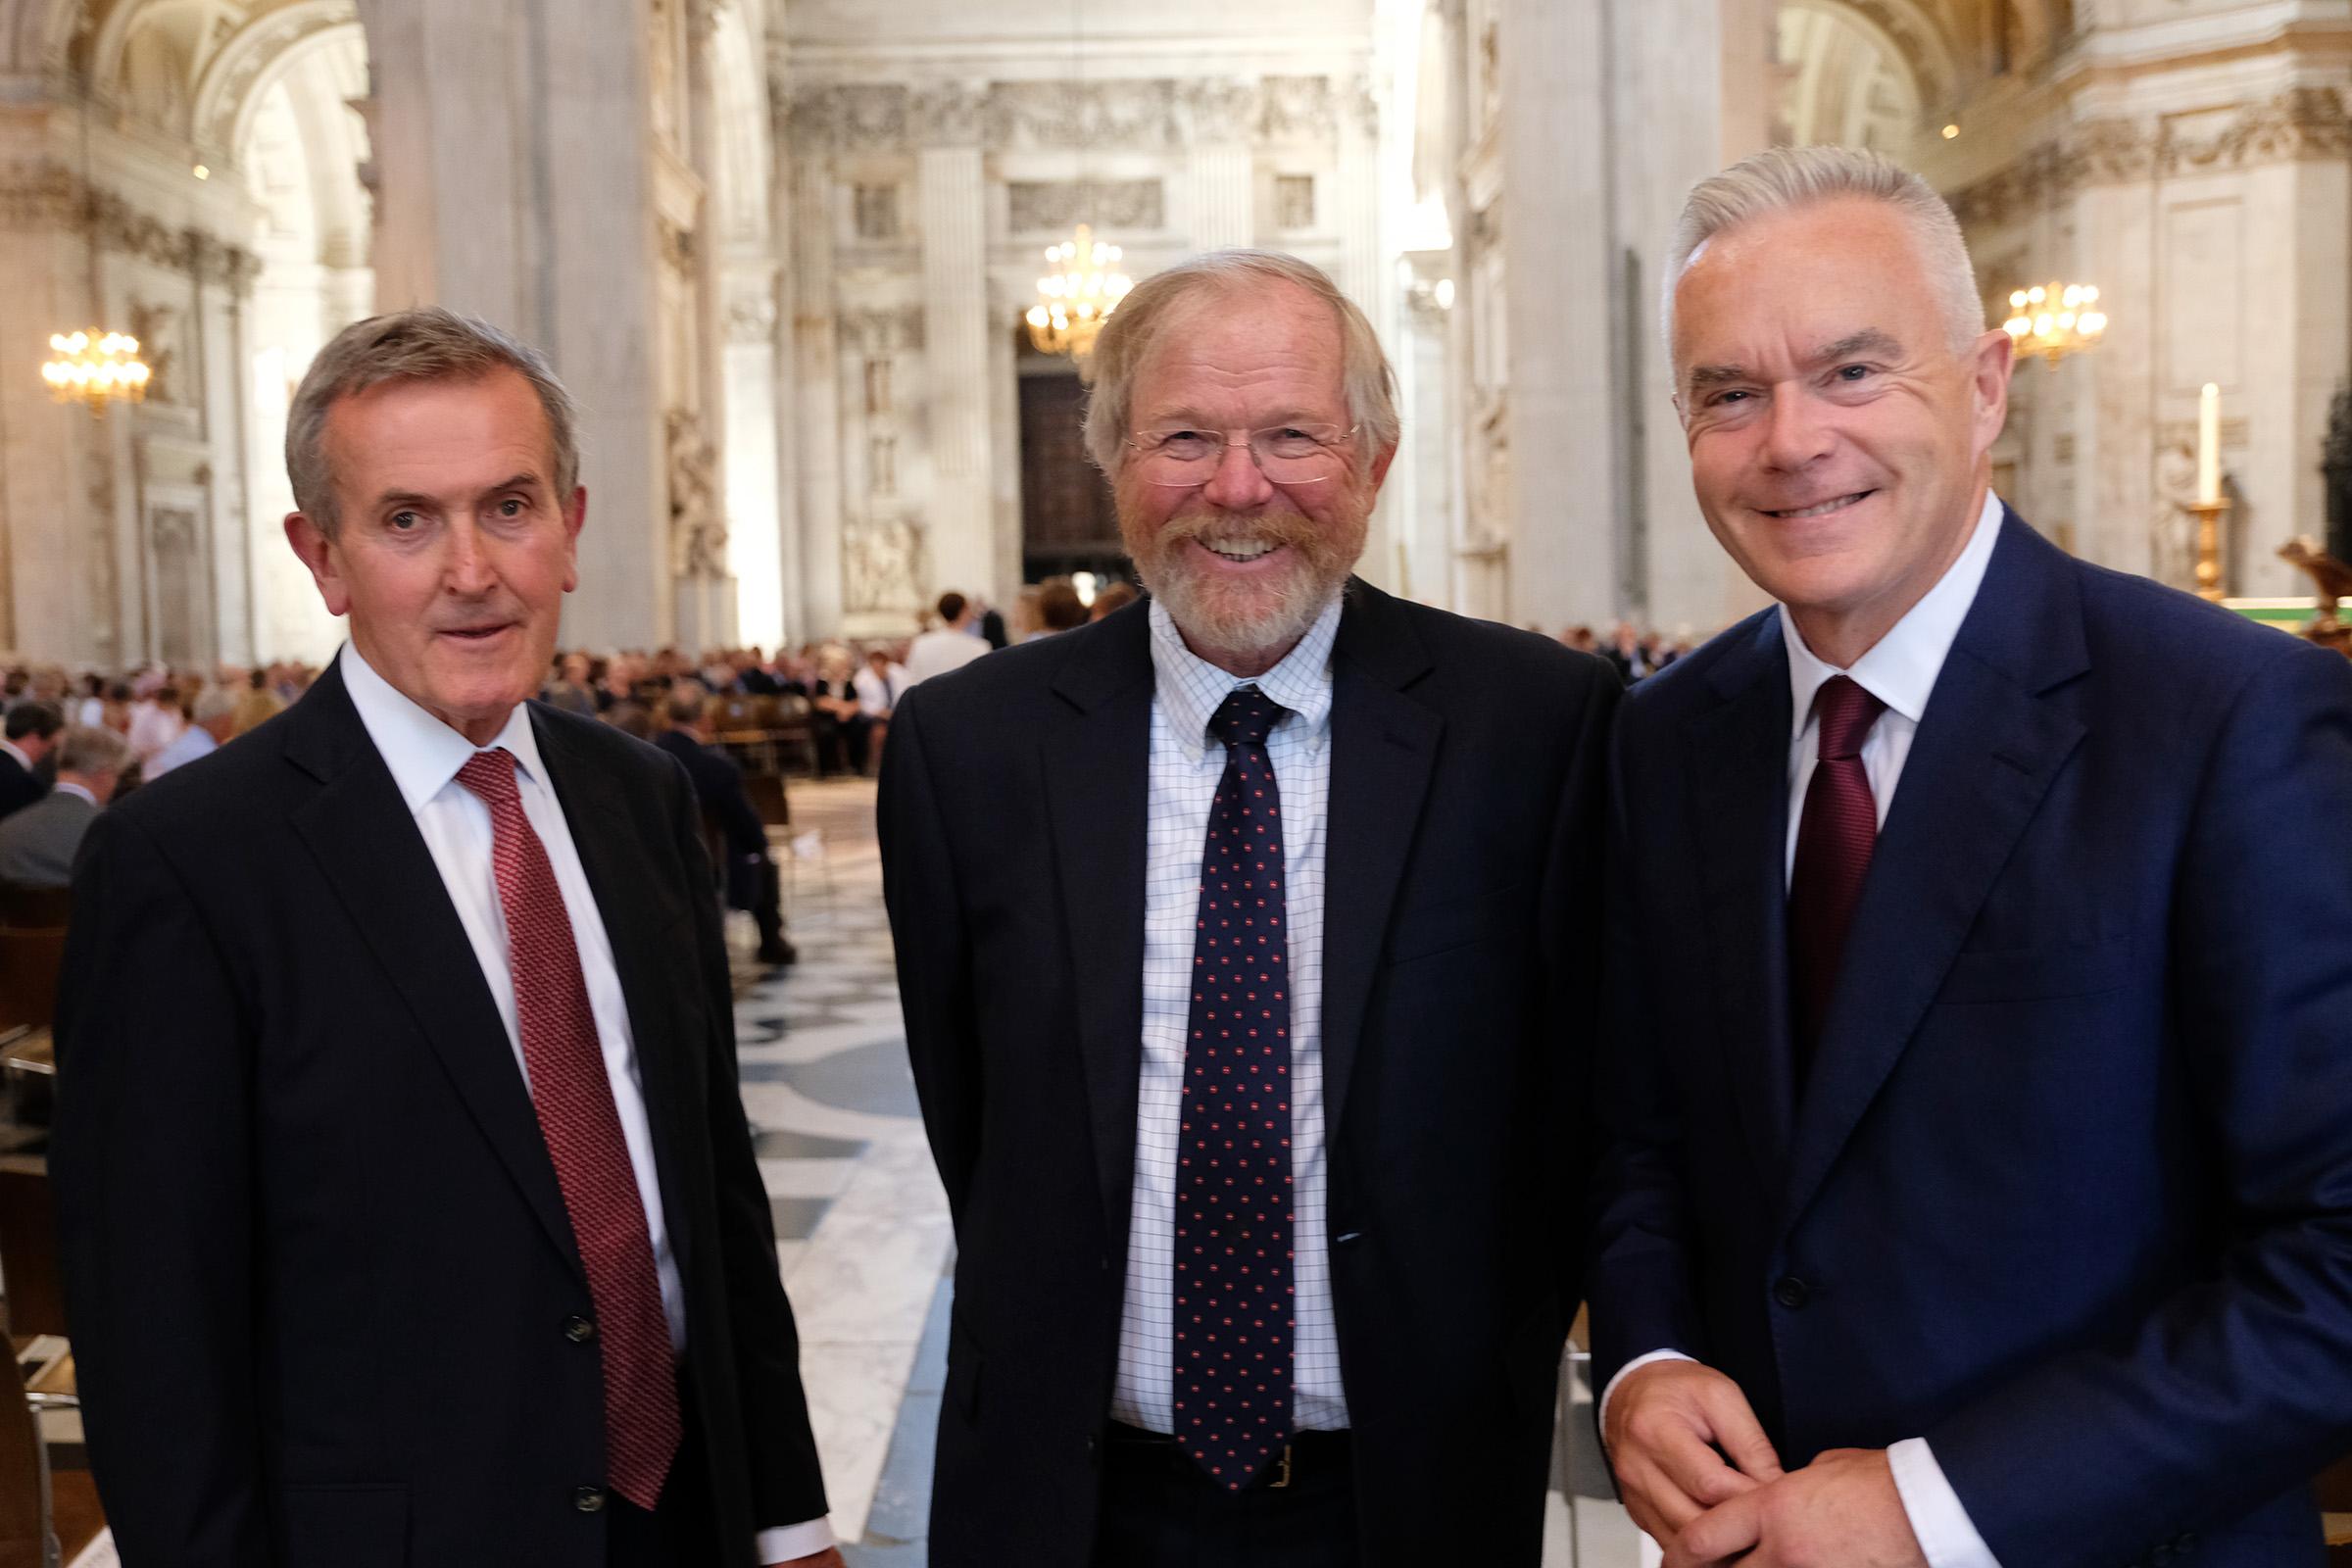 Neil MacGregor, Bill Bryson, Huw Edwards